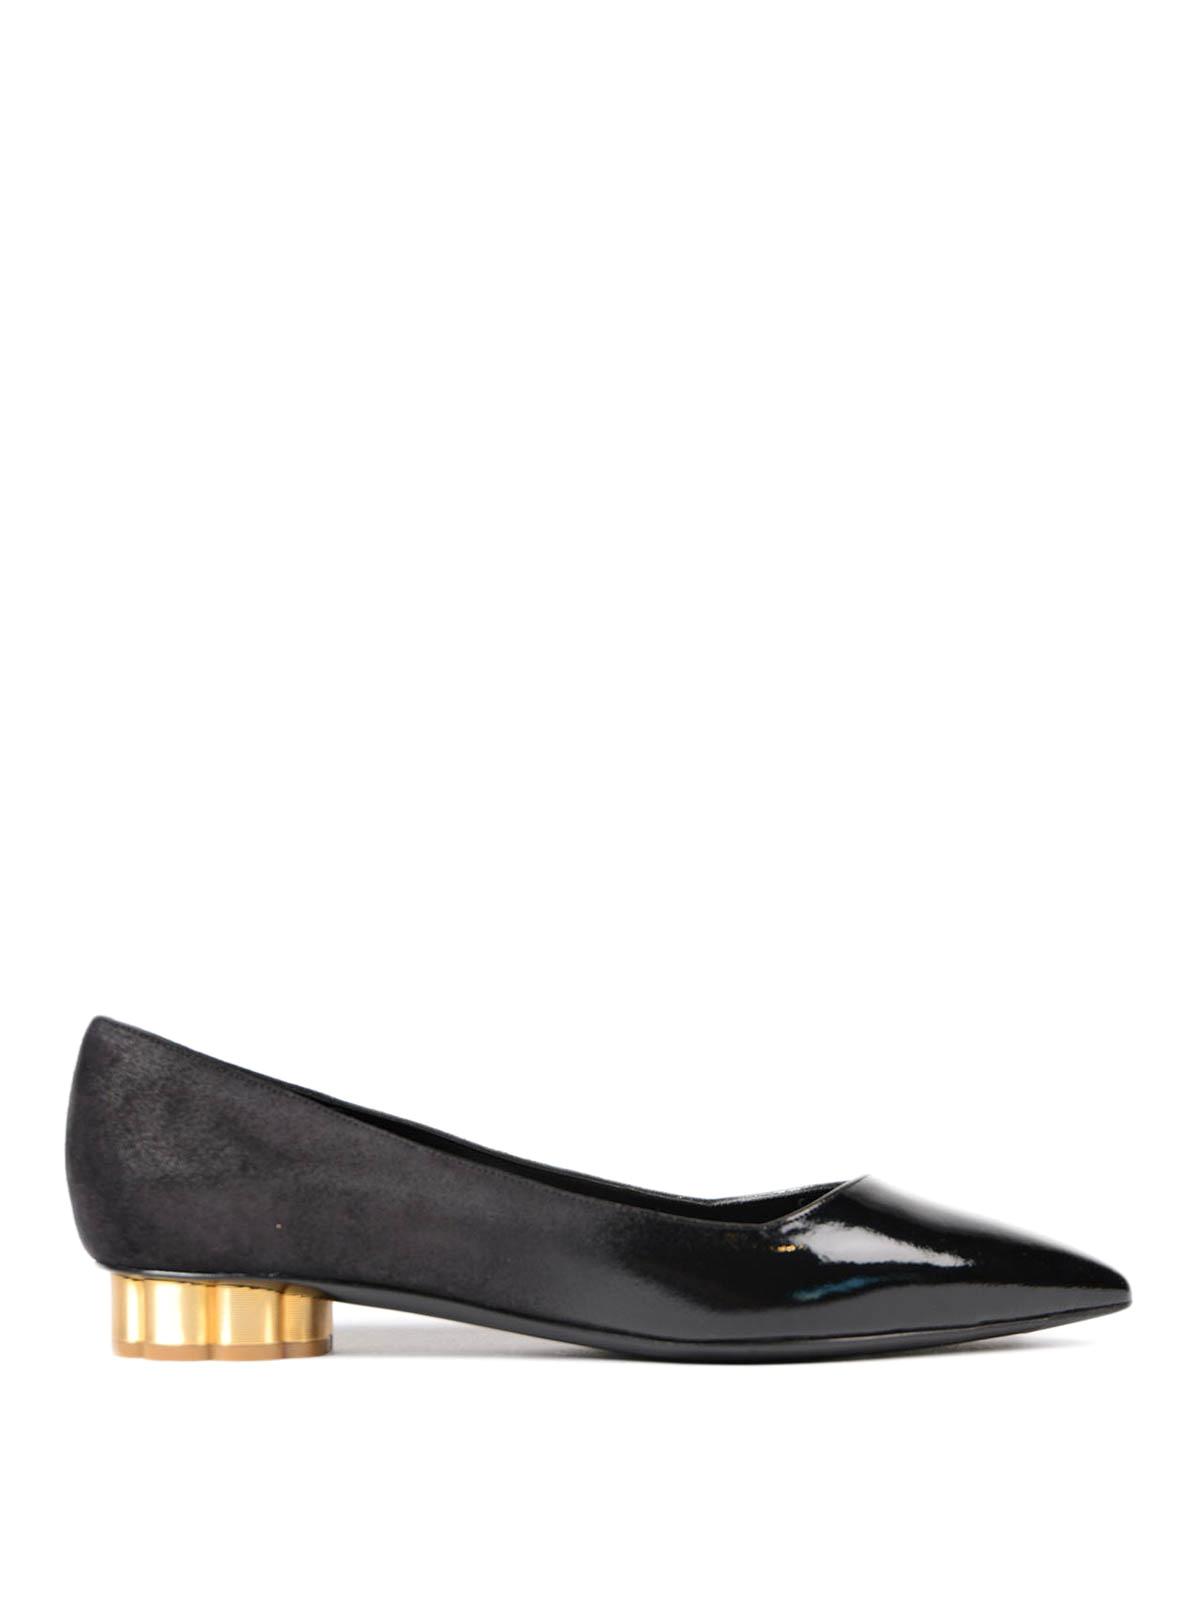 0978b2f98 Salvatore Ferragamo - Bari flower heel flats - flat shoes ...